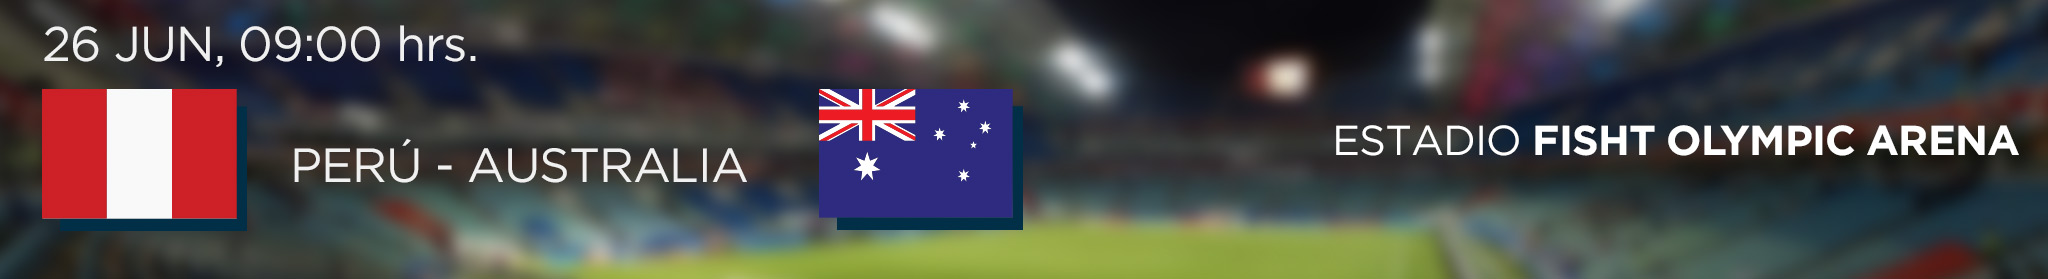 2048×279-peru-australia-fisht-olympic